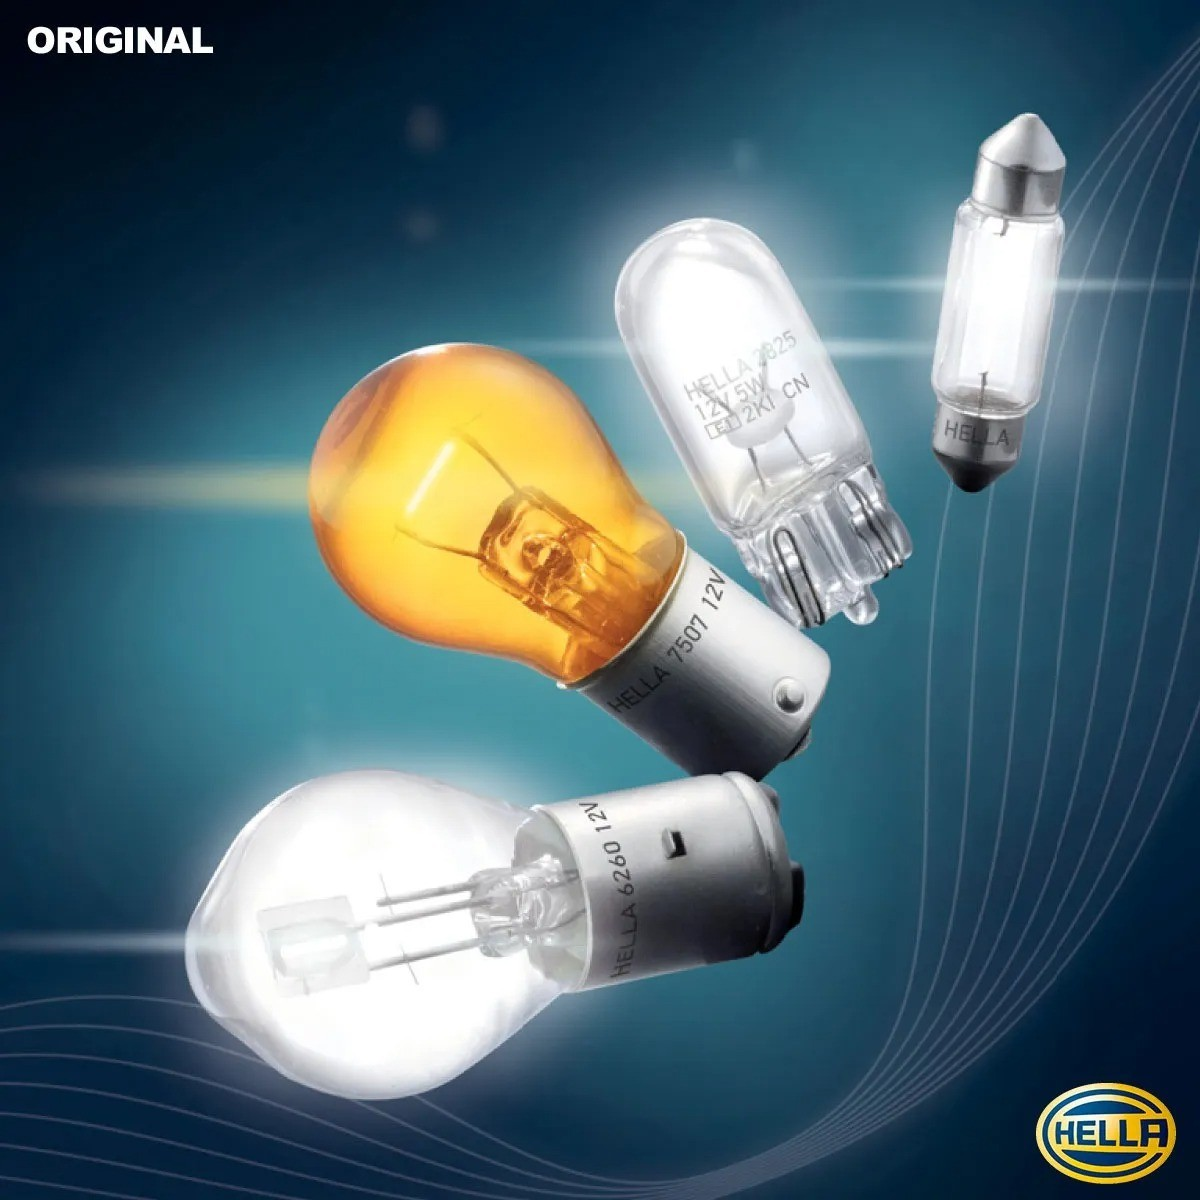 LAMPADA CONVENCIONAL 12V 55W FAROL H11 UNIVERSAL HELLA